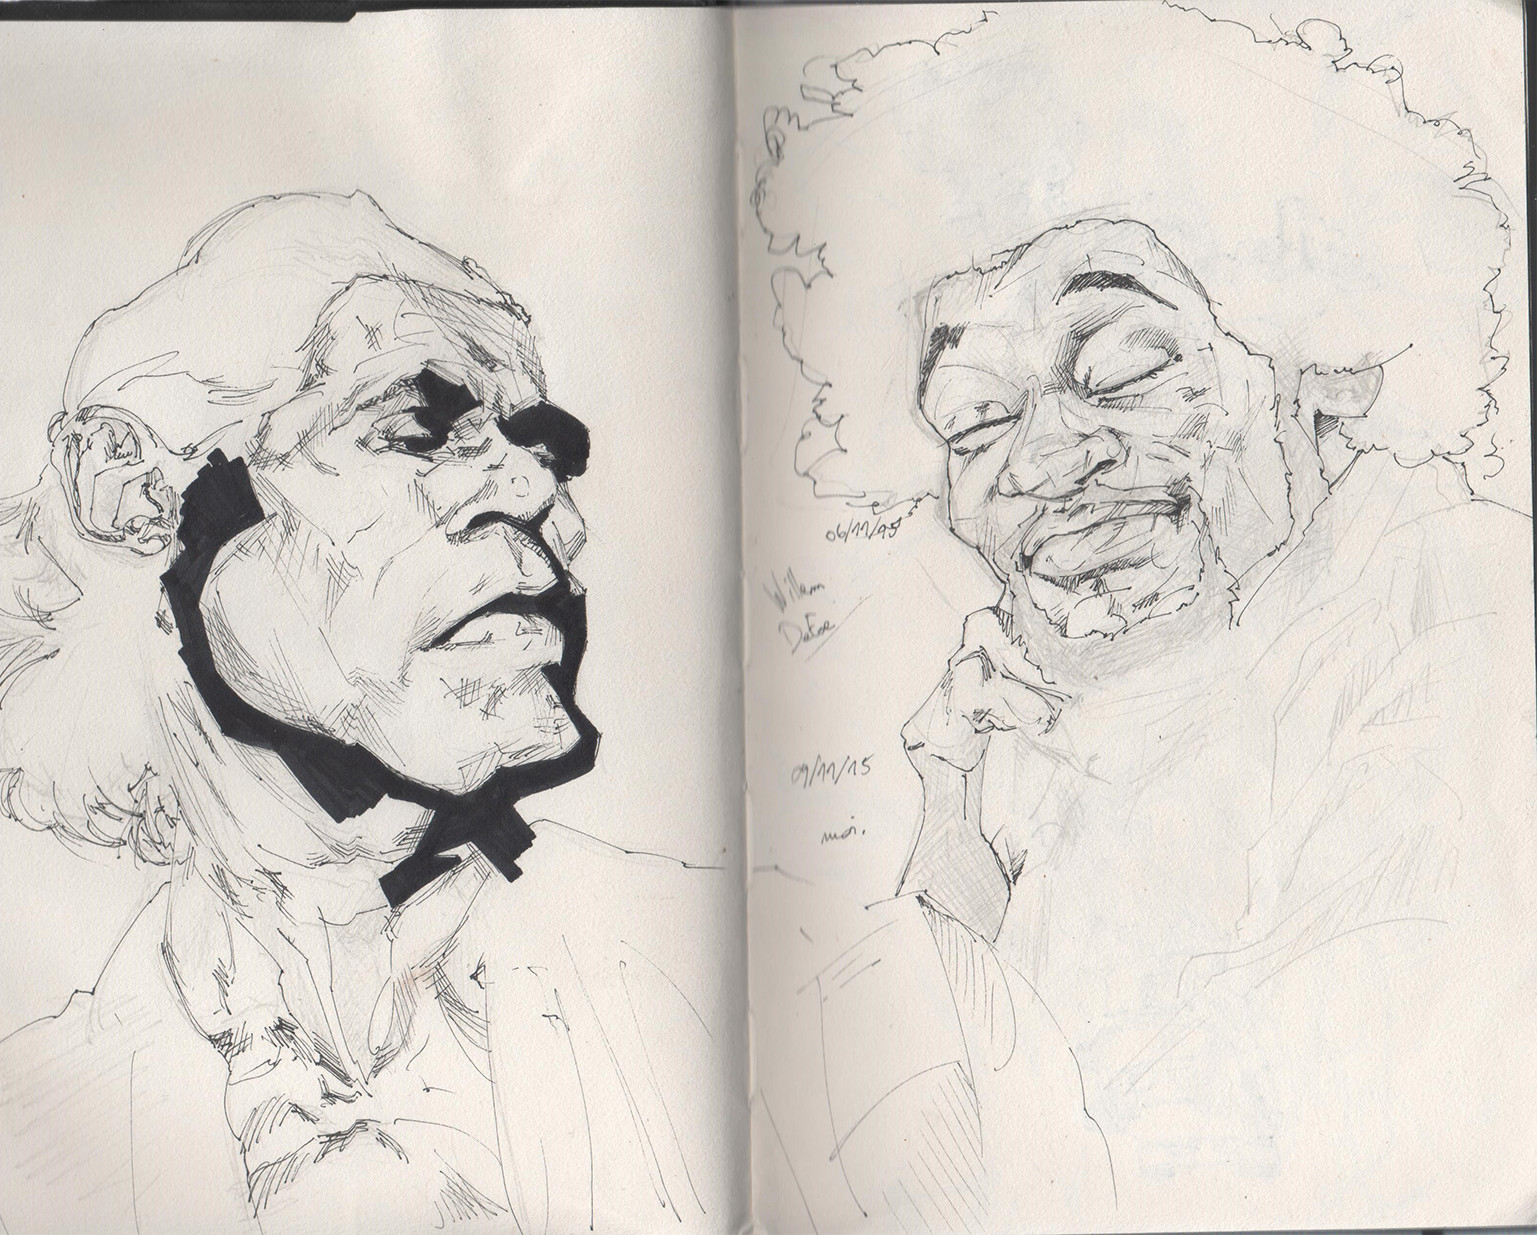 Tony gbeulie post sketch1